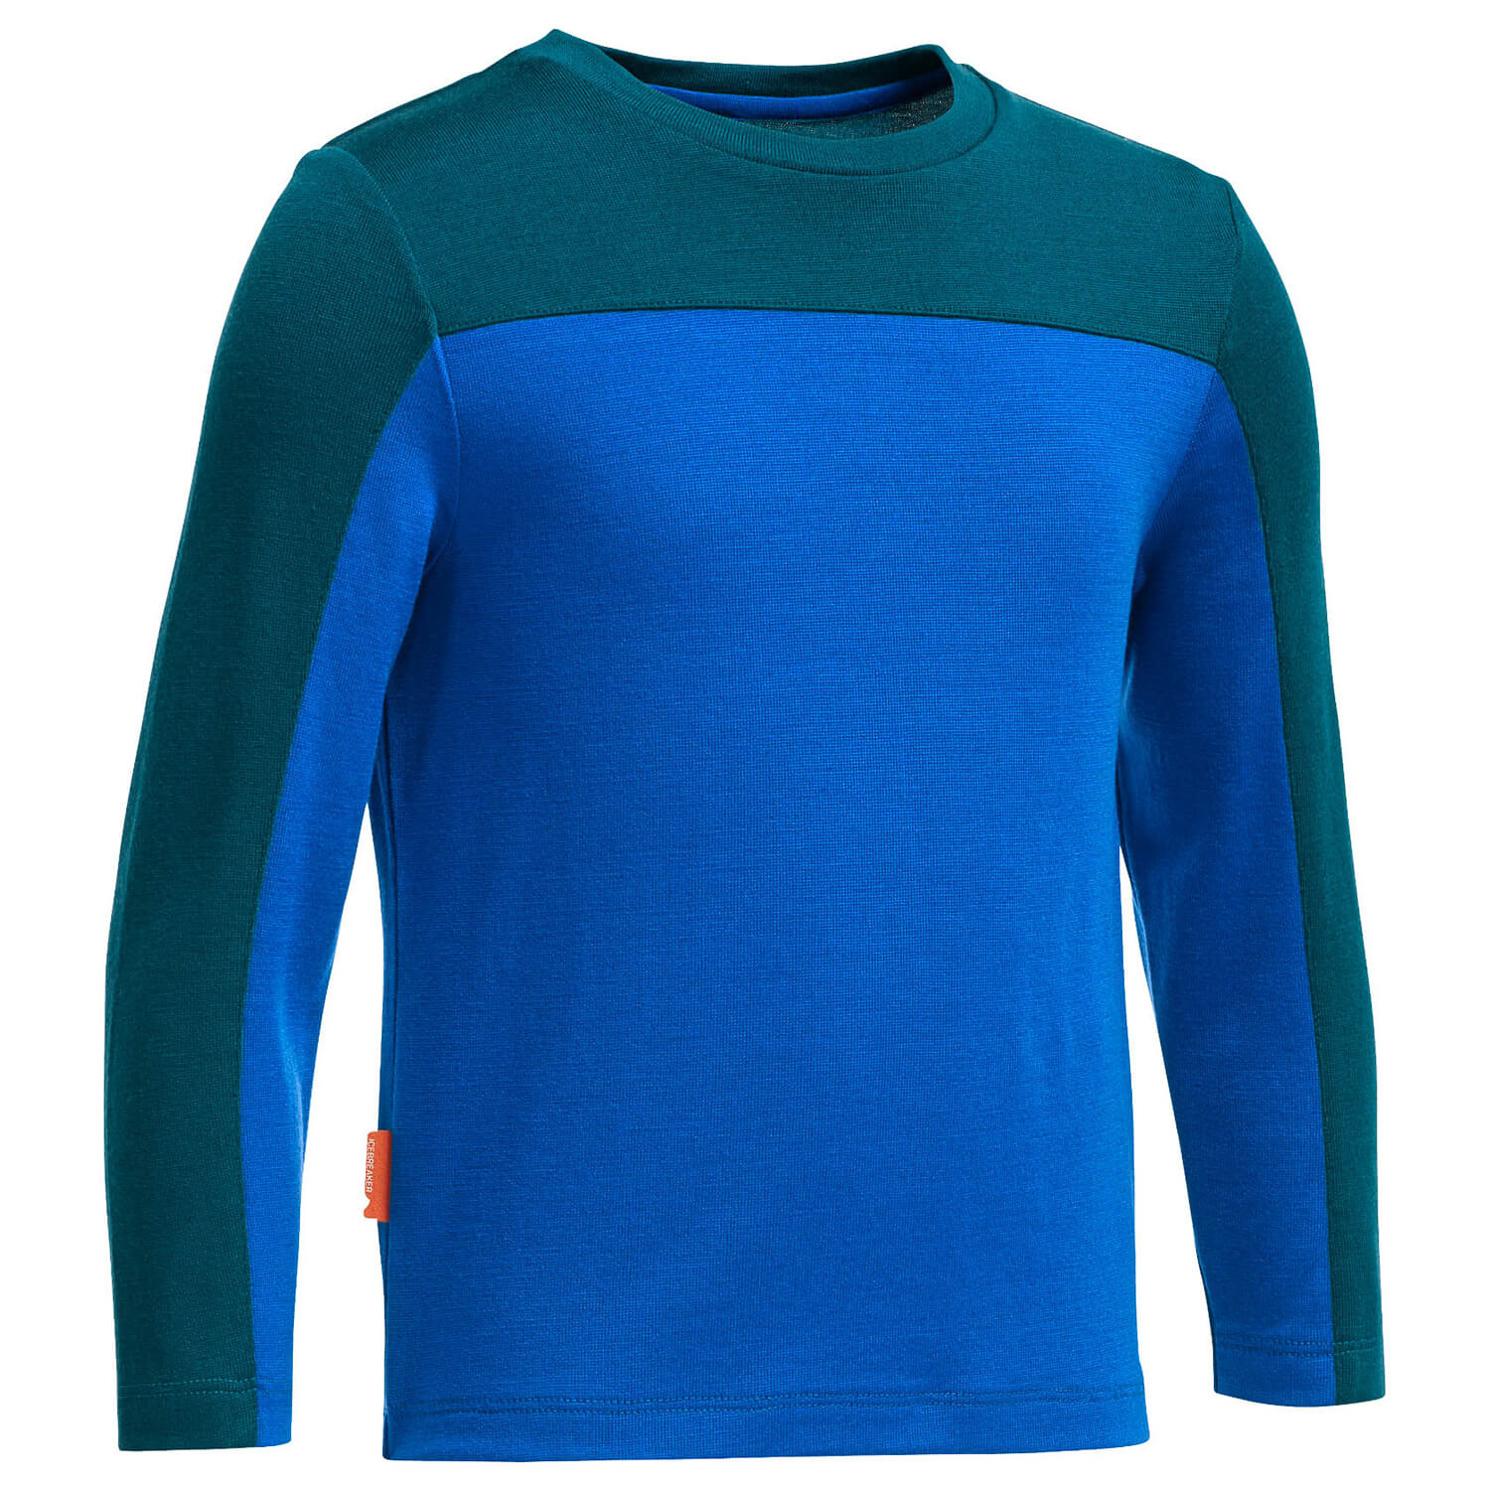 icebreaker merino wool clothing uk sweater tunic. Black Bedroom Furniture Sets. Home Design Ideas